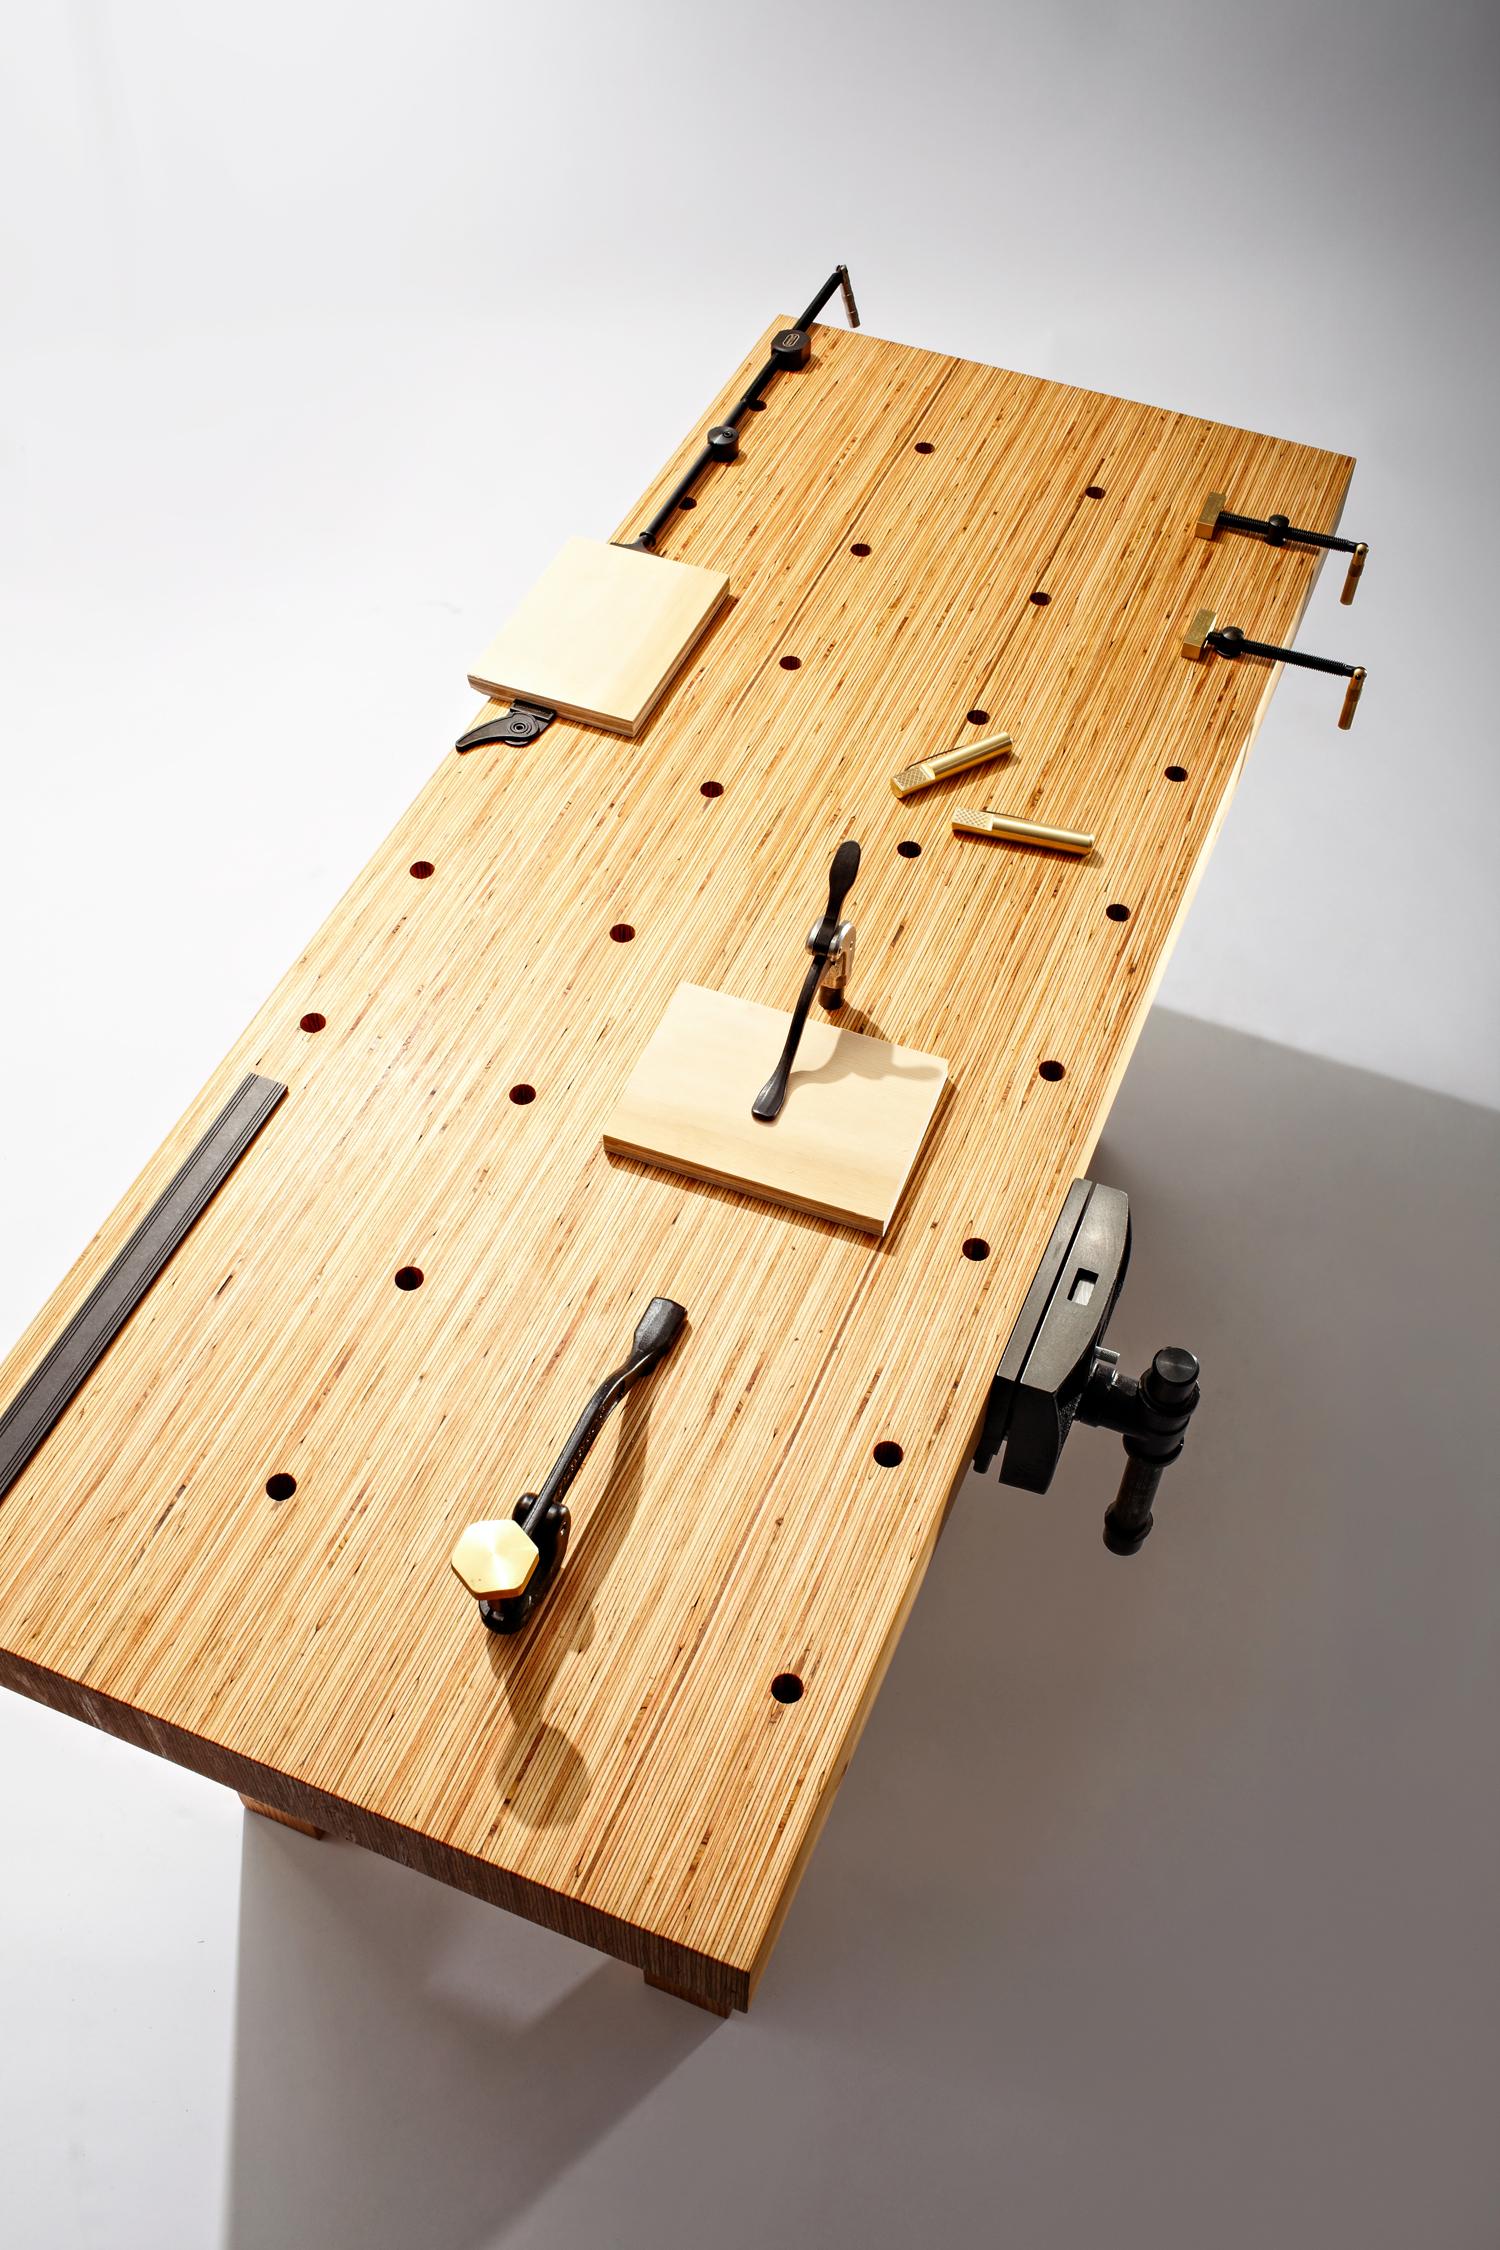 Foyer Bench Popular Mechanics : How to build this diy workbench